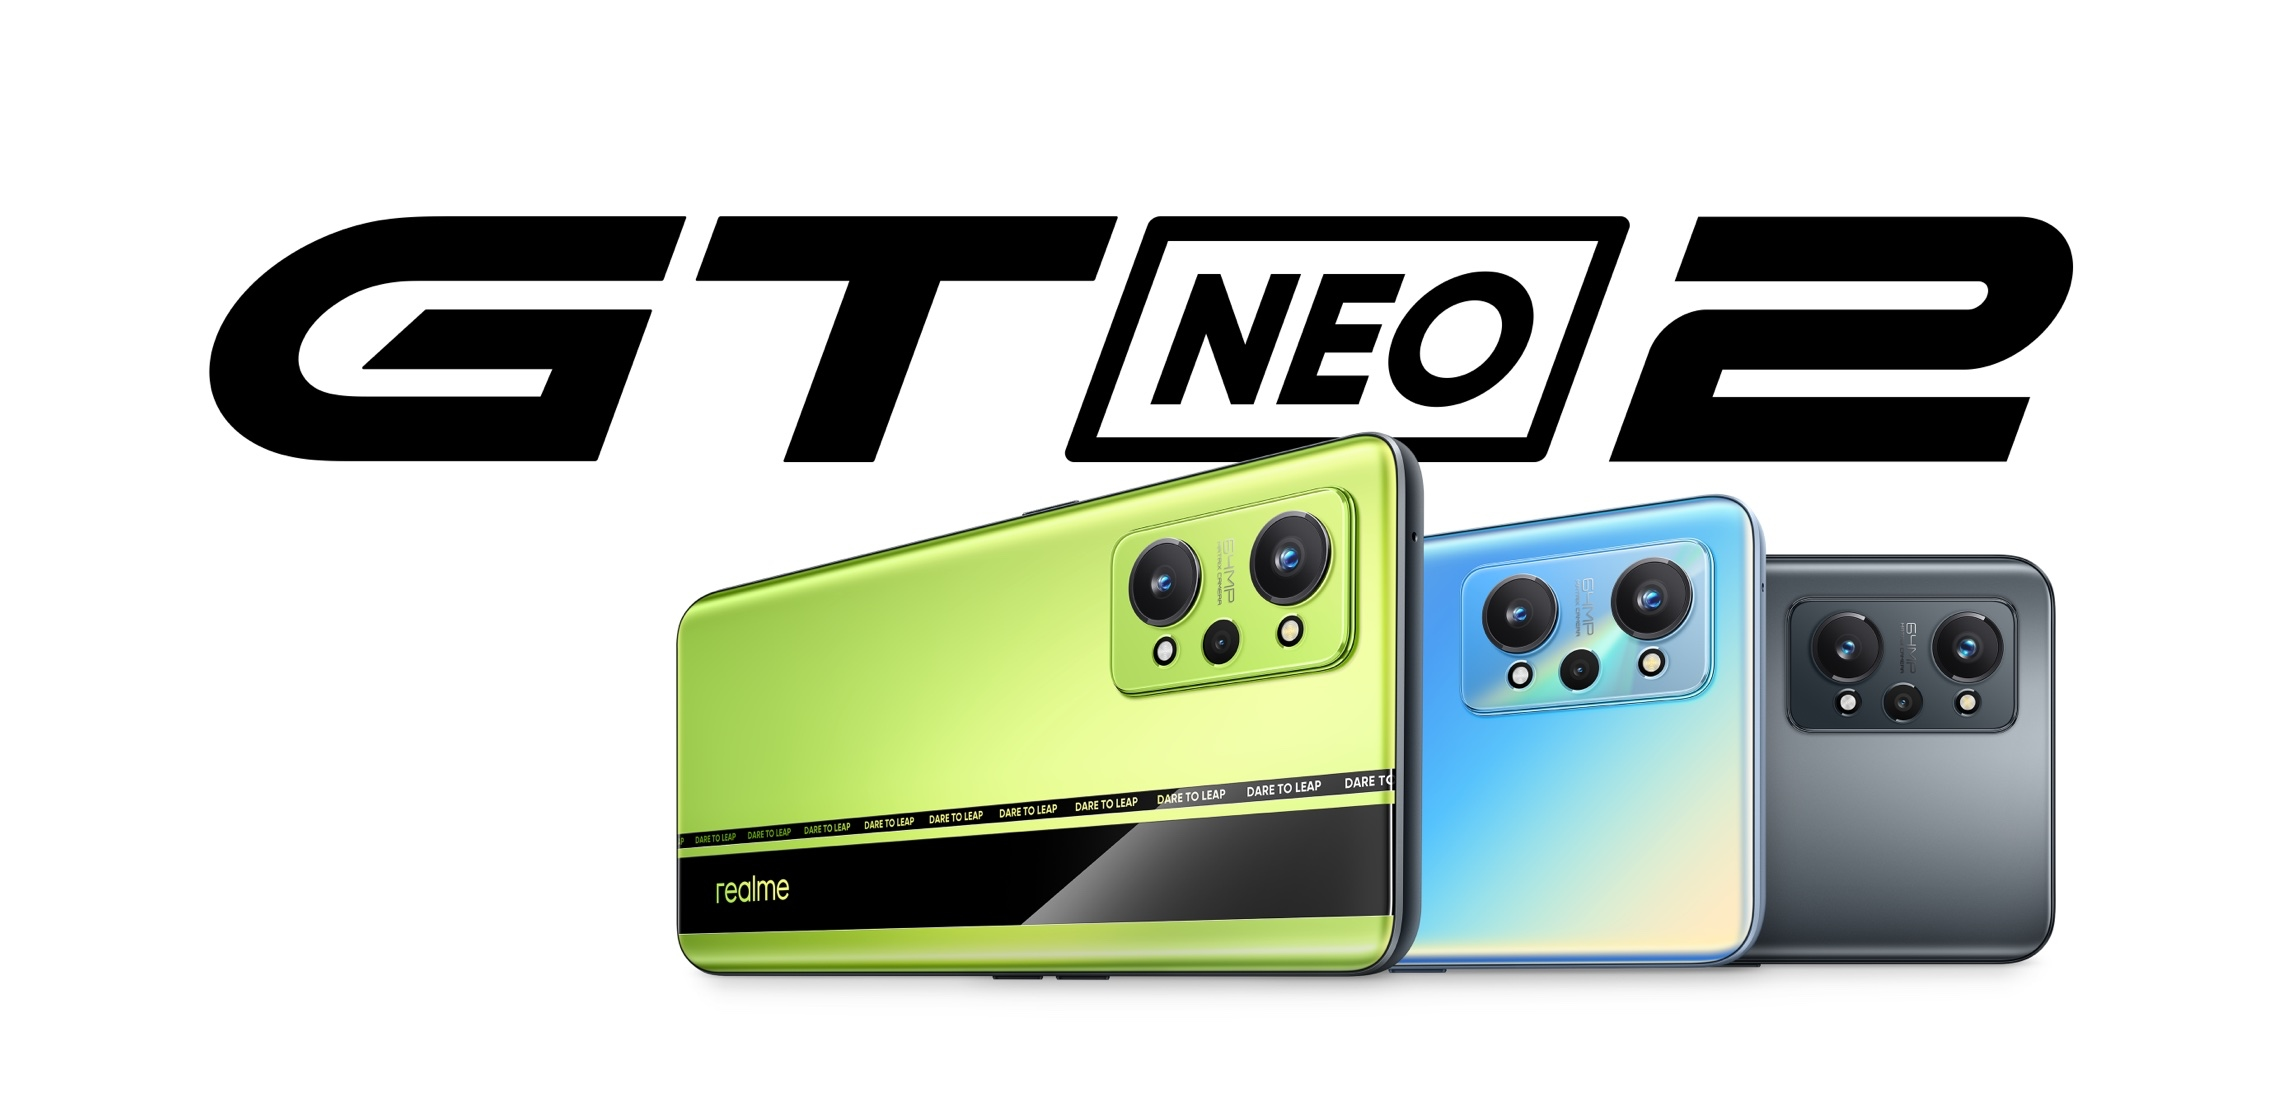 Realme GT Neo 2: чип Snapdragon 870, тройная камера на 64 МП, быстрая зарядка на 65 Вт и ценник от $386